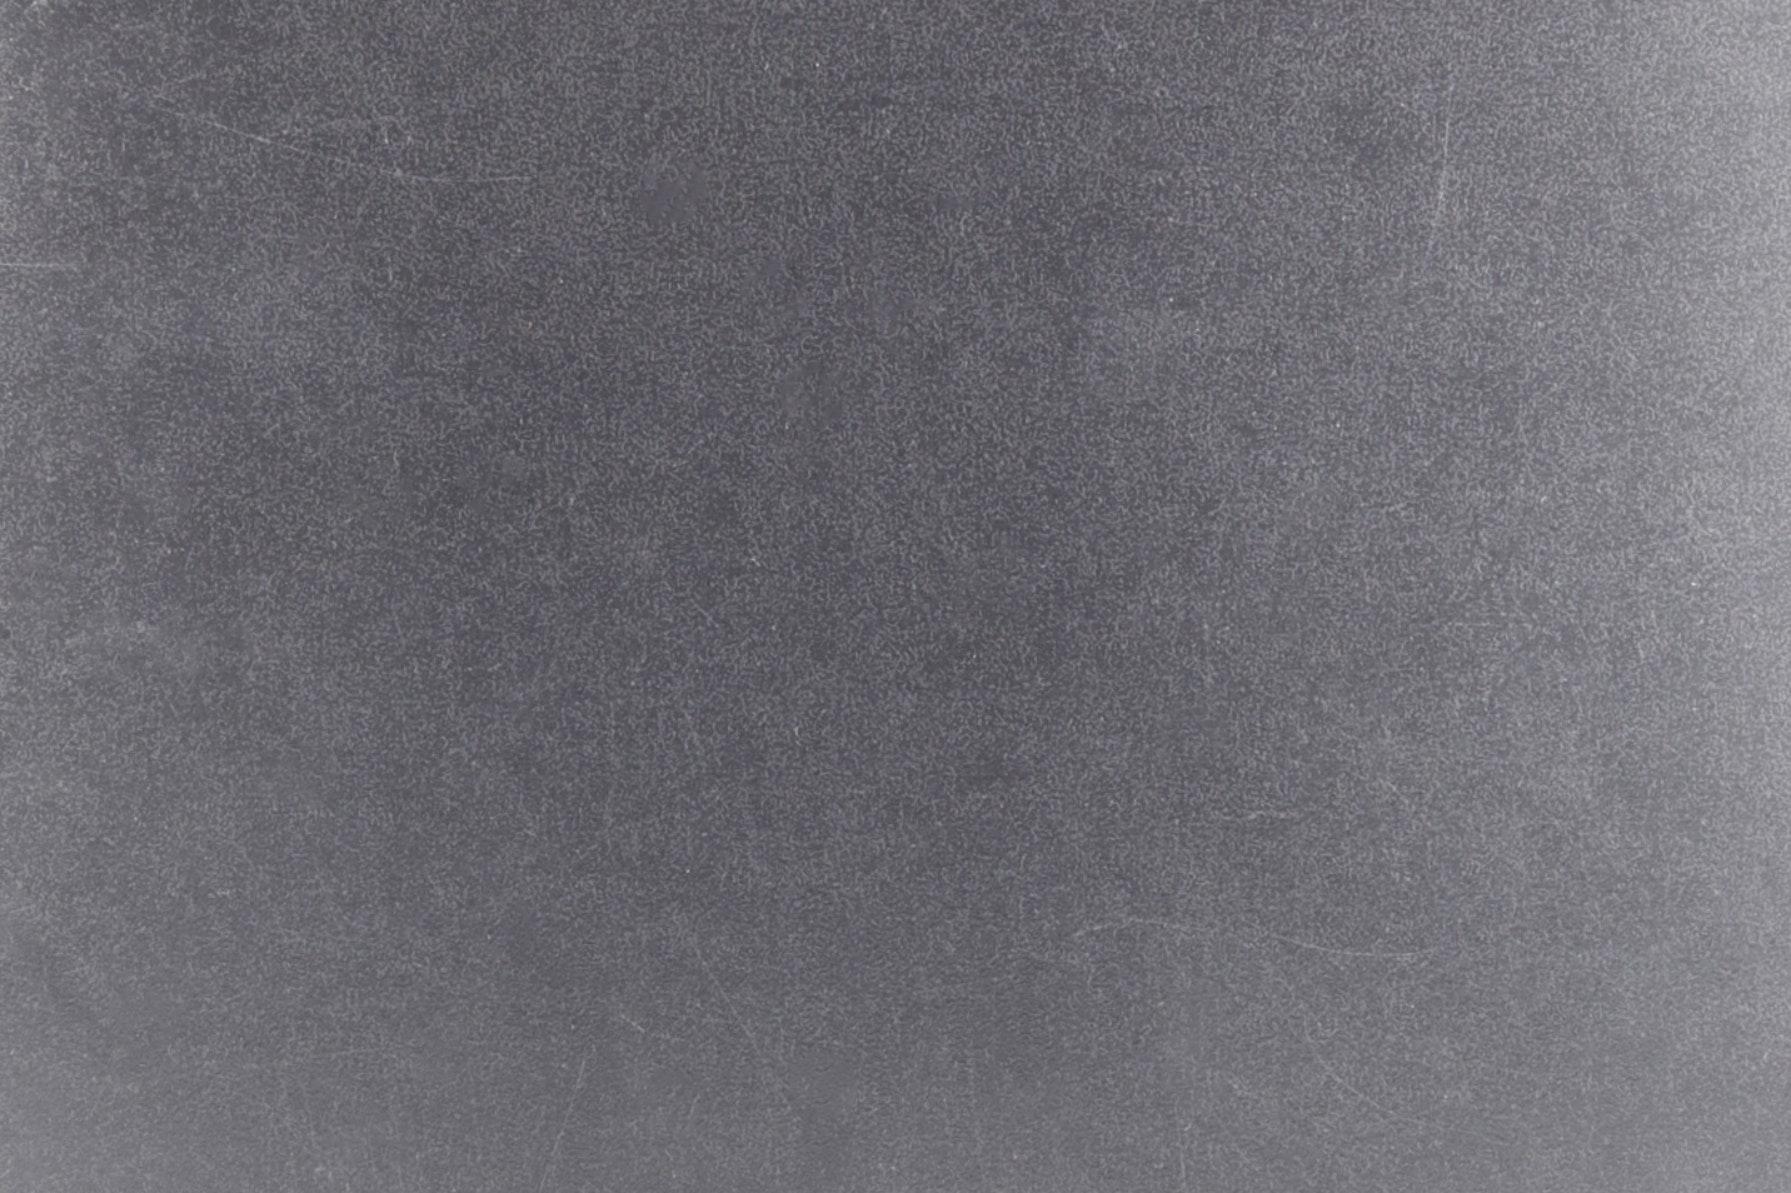 Kontaktplast D-C-Fix 45 Transparent Blank